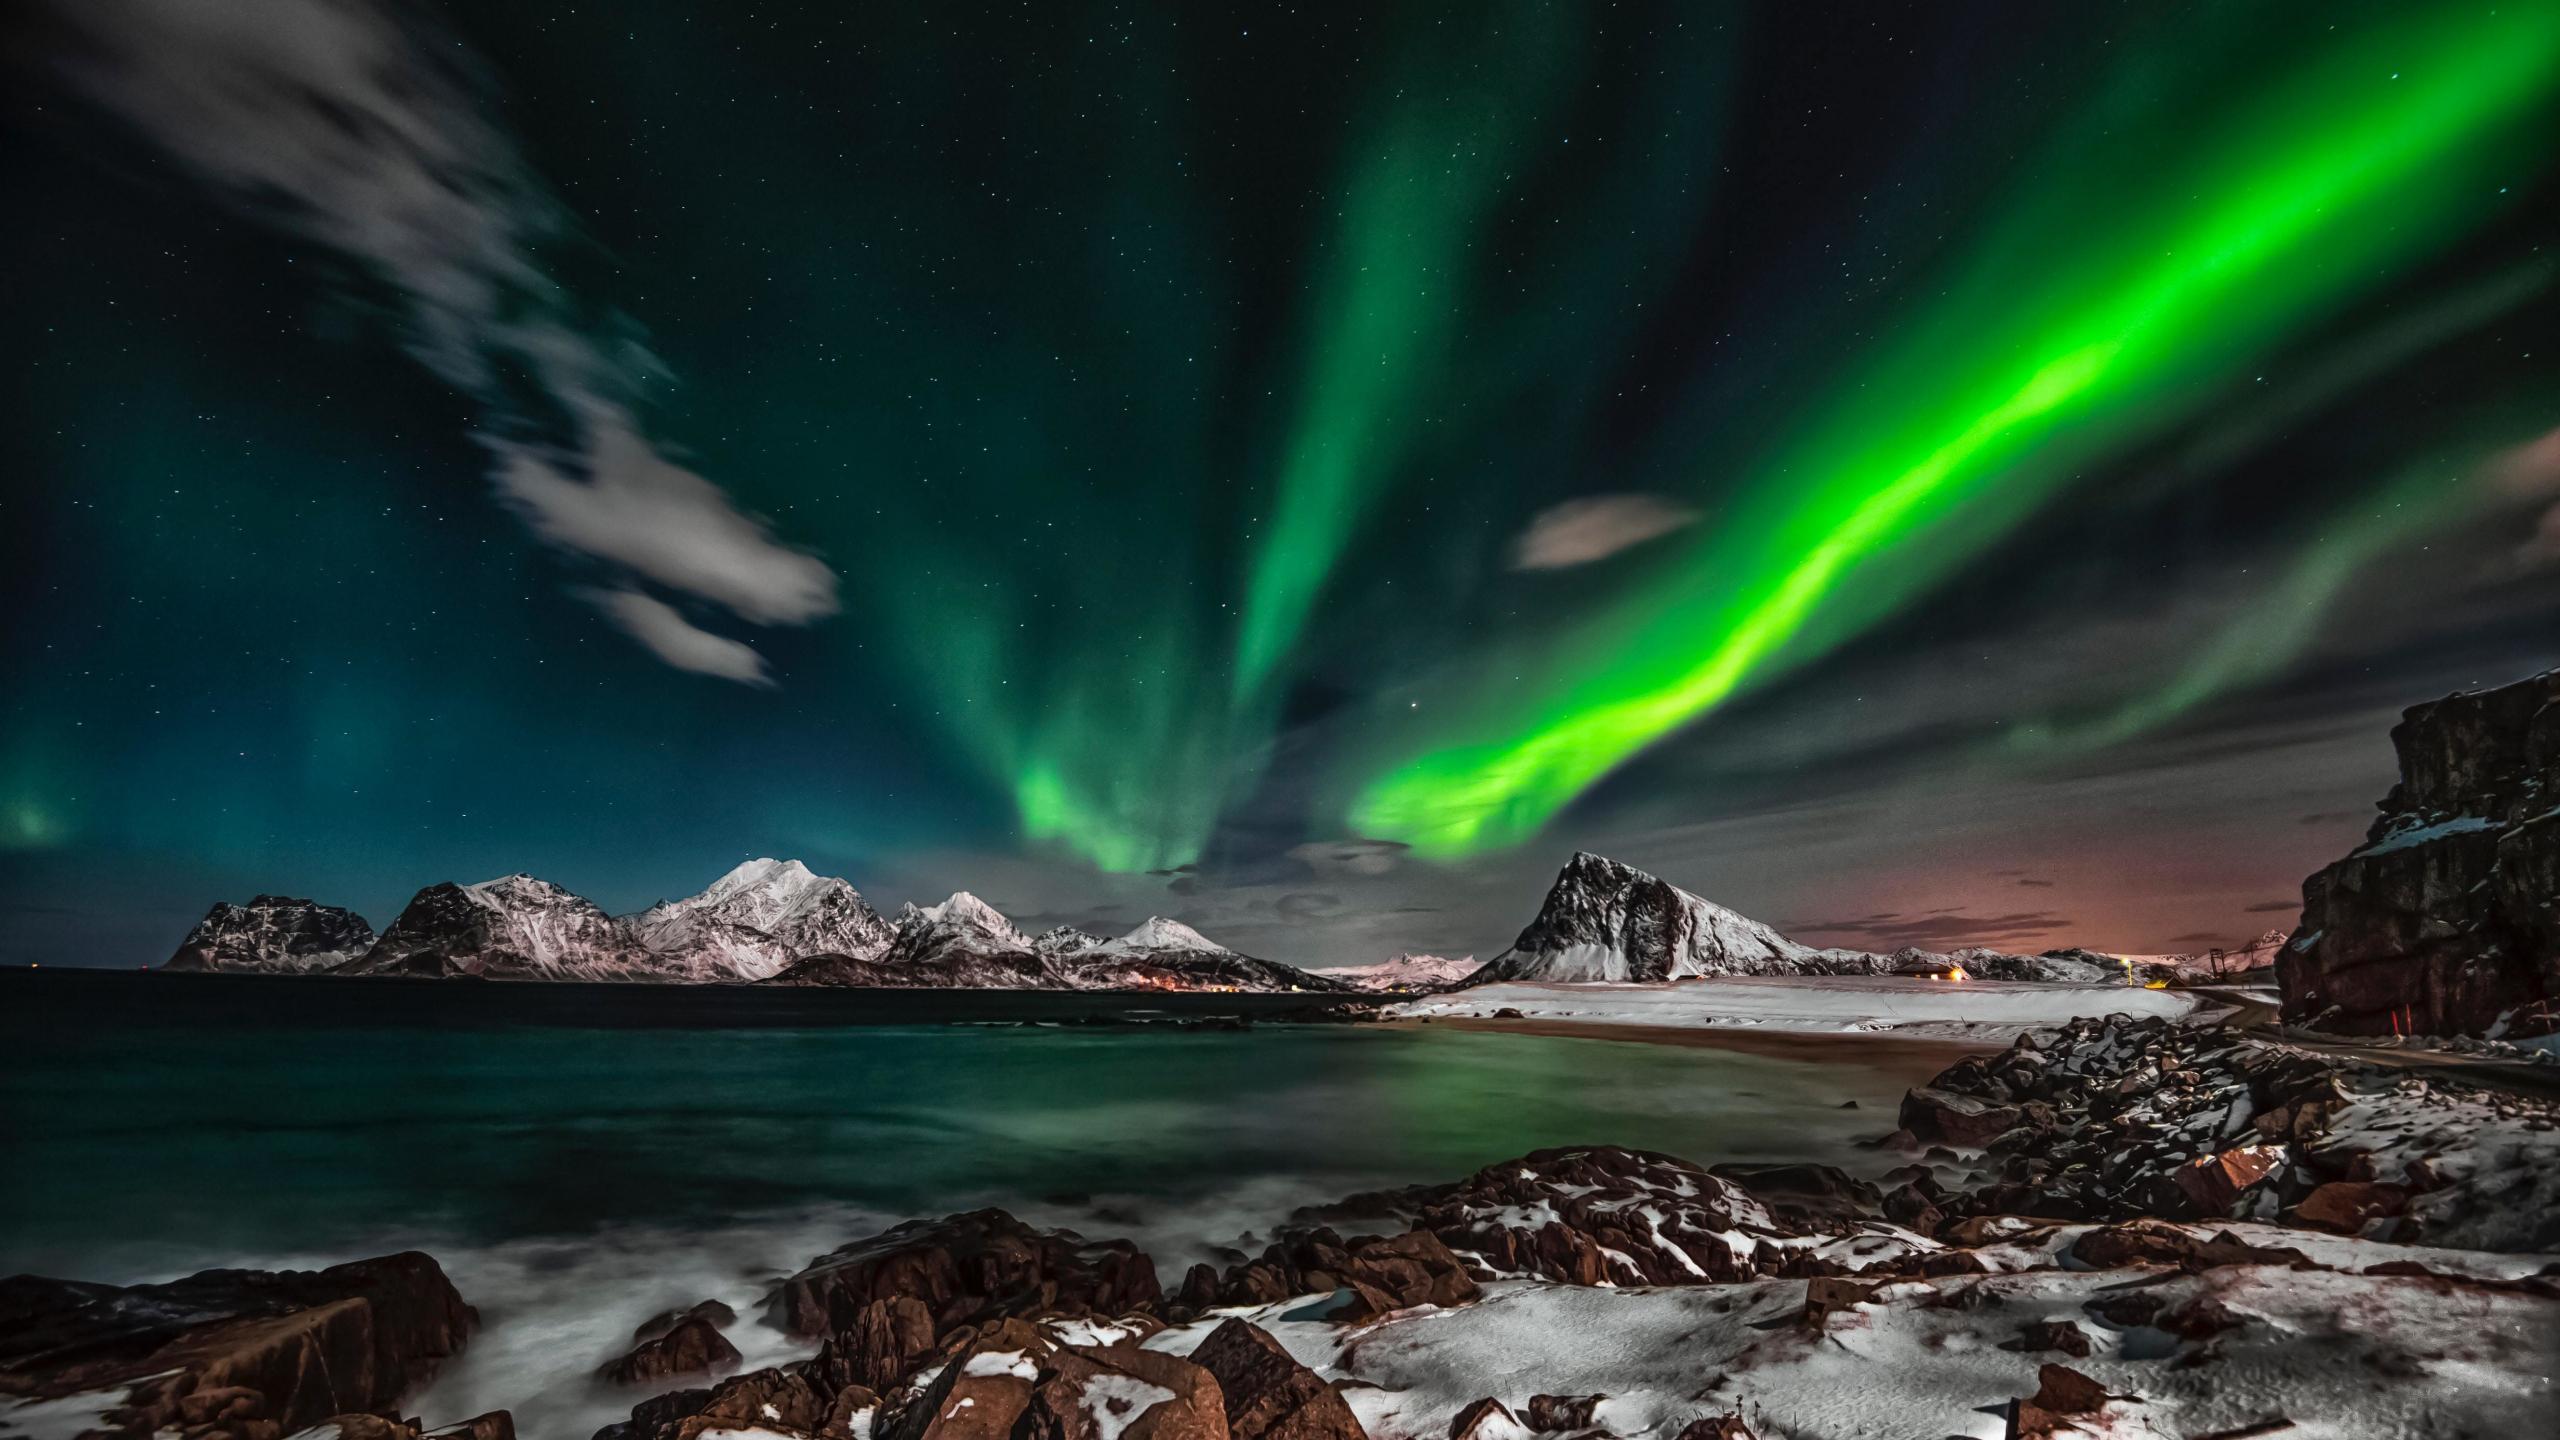 Download 2560x1440 wallpaper arctic, mountains, nature ...